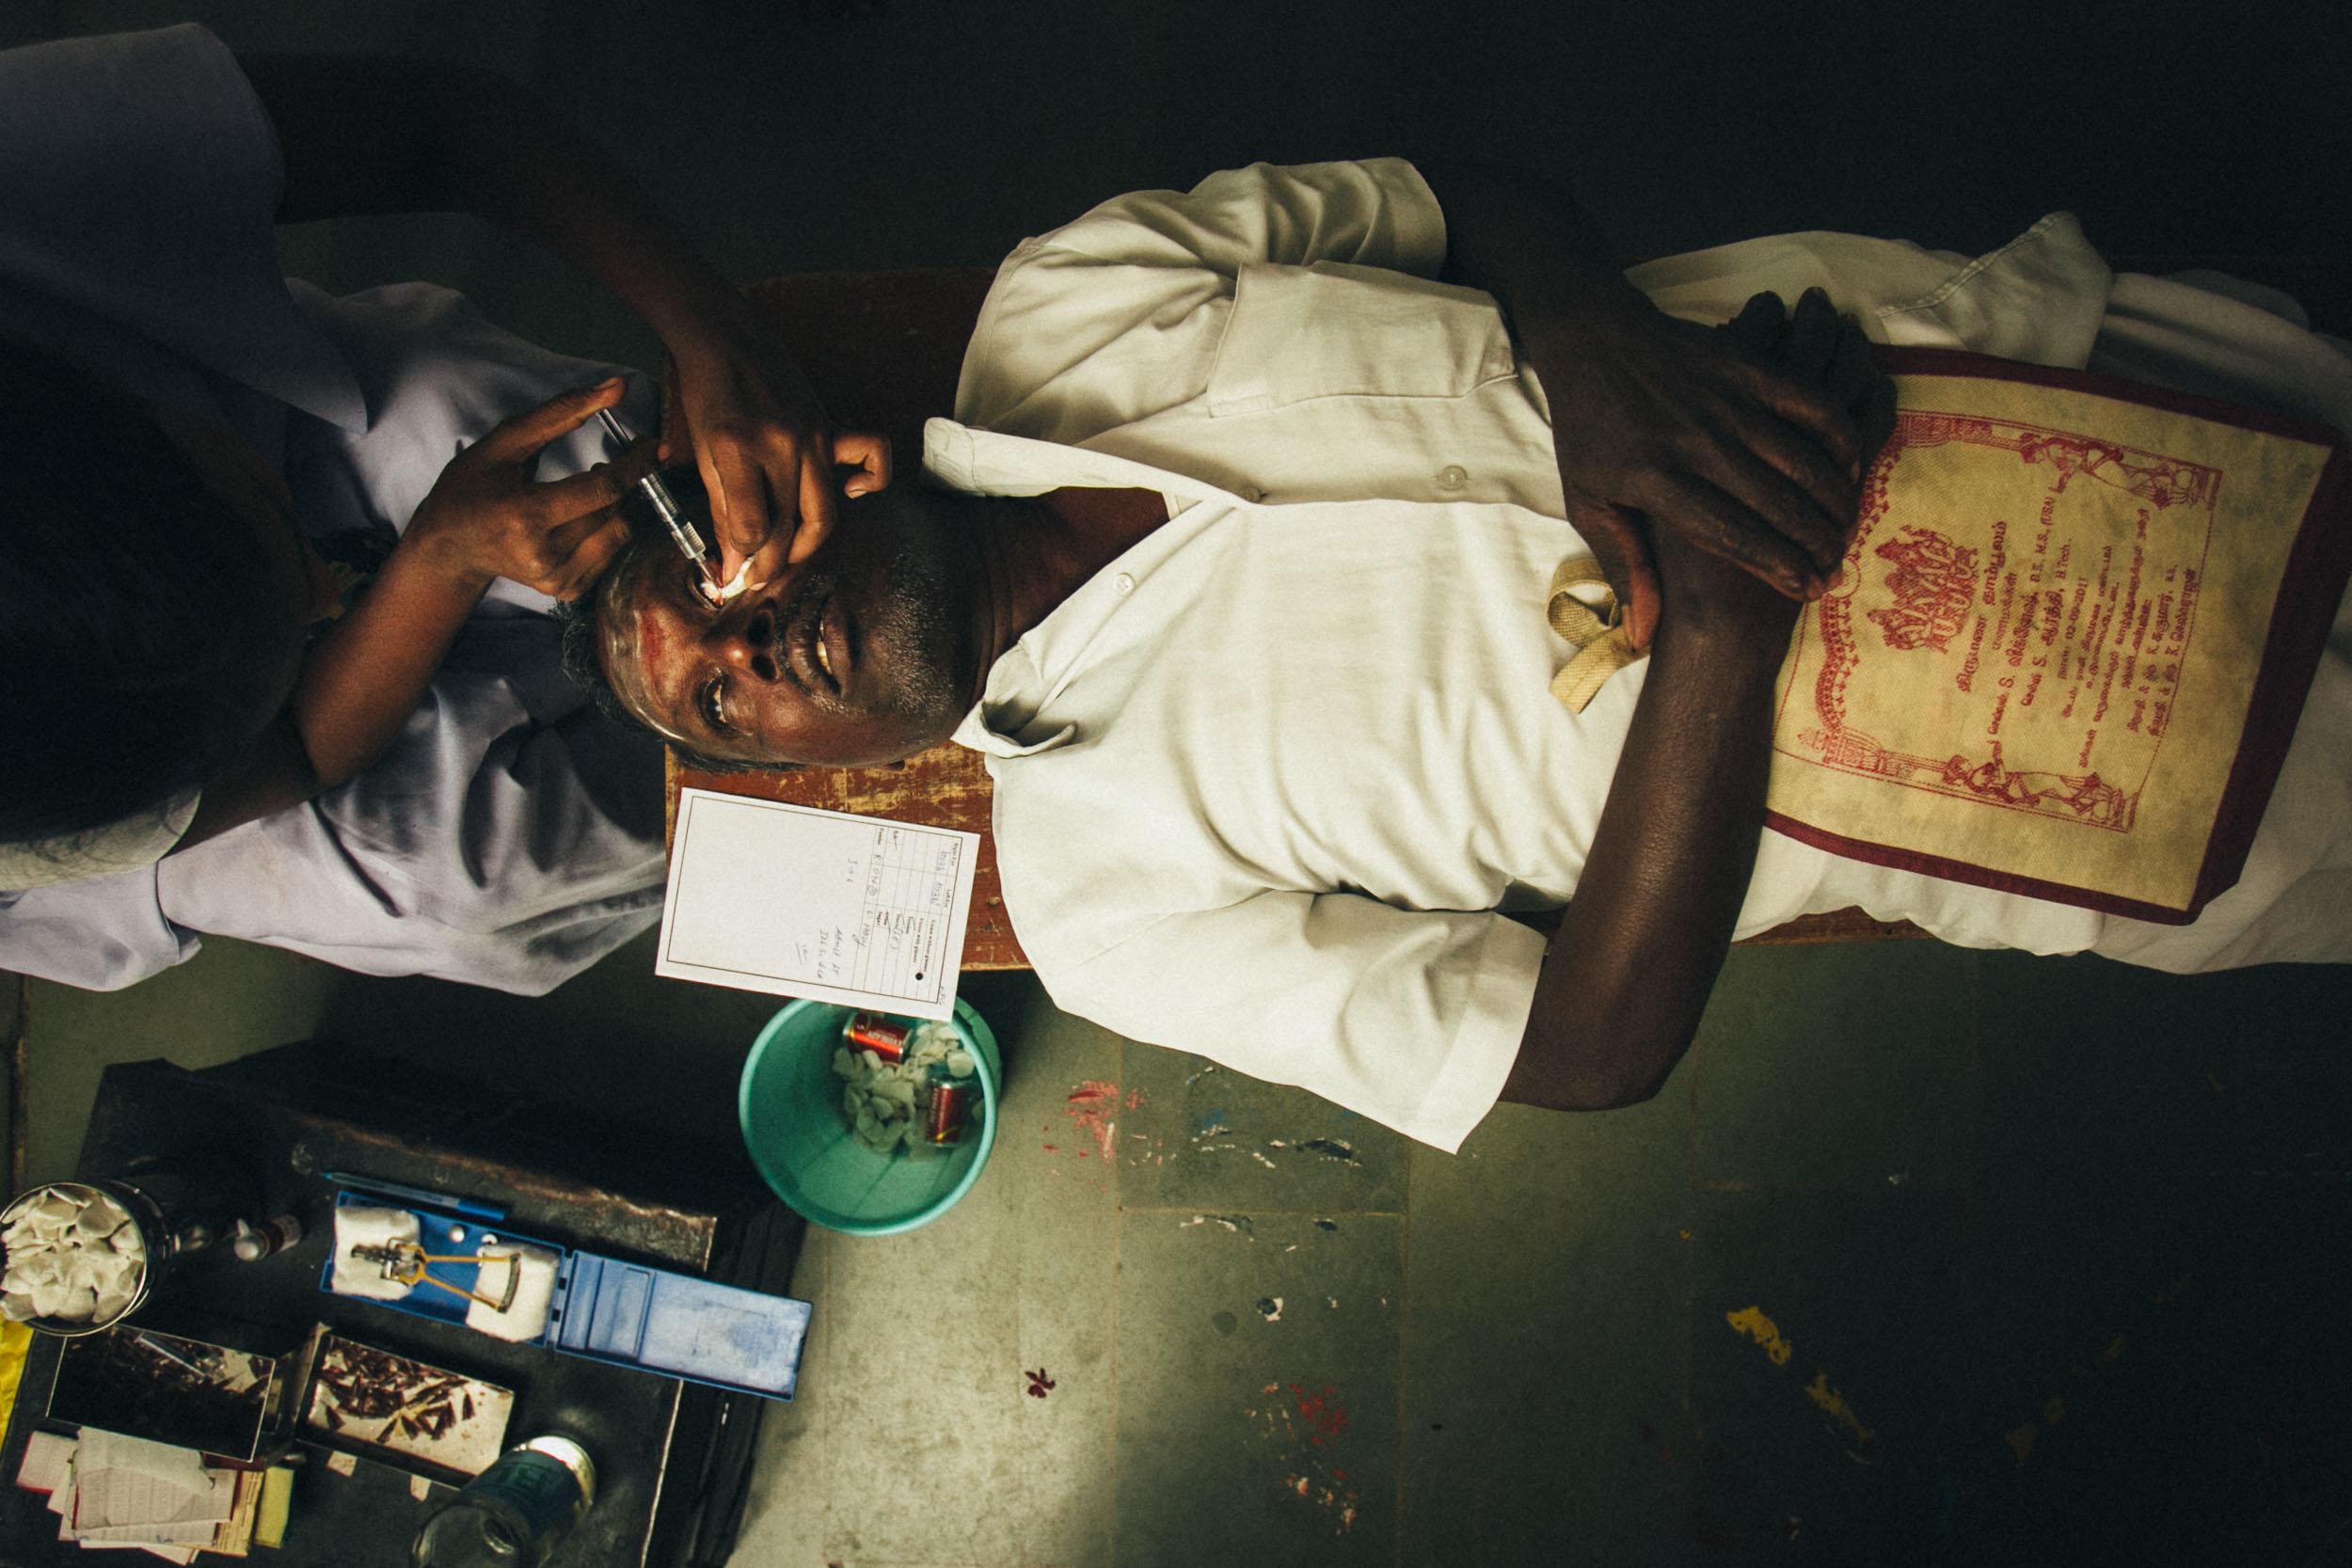 brian-callaway-india-photography-aravind-eye-hospital-06.jpg